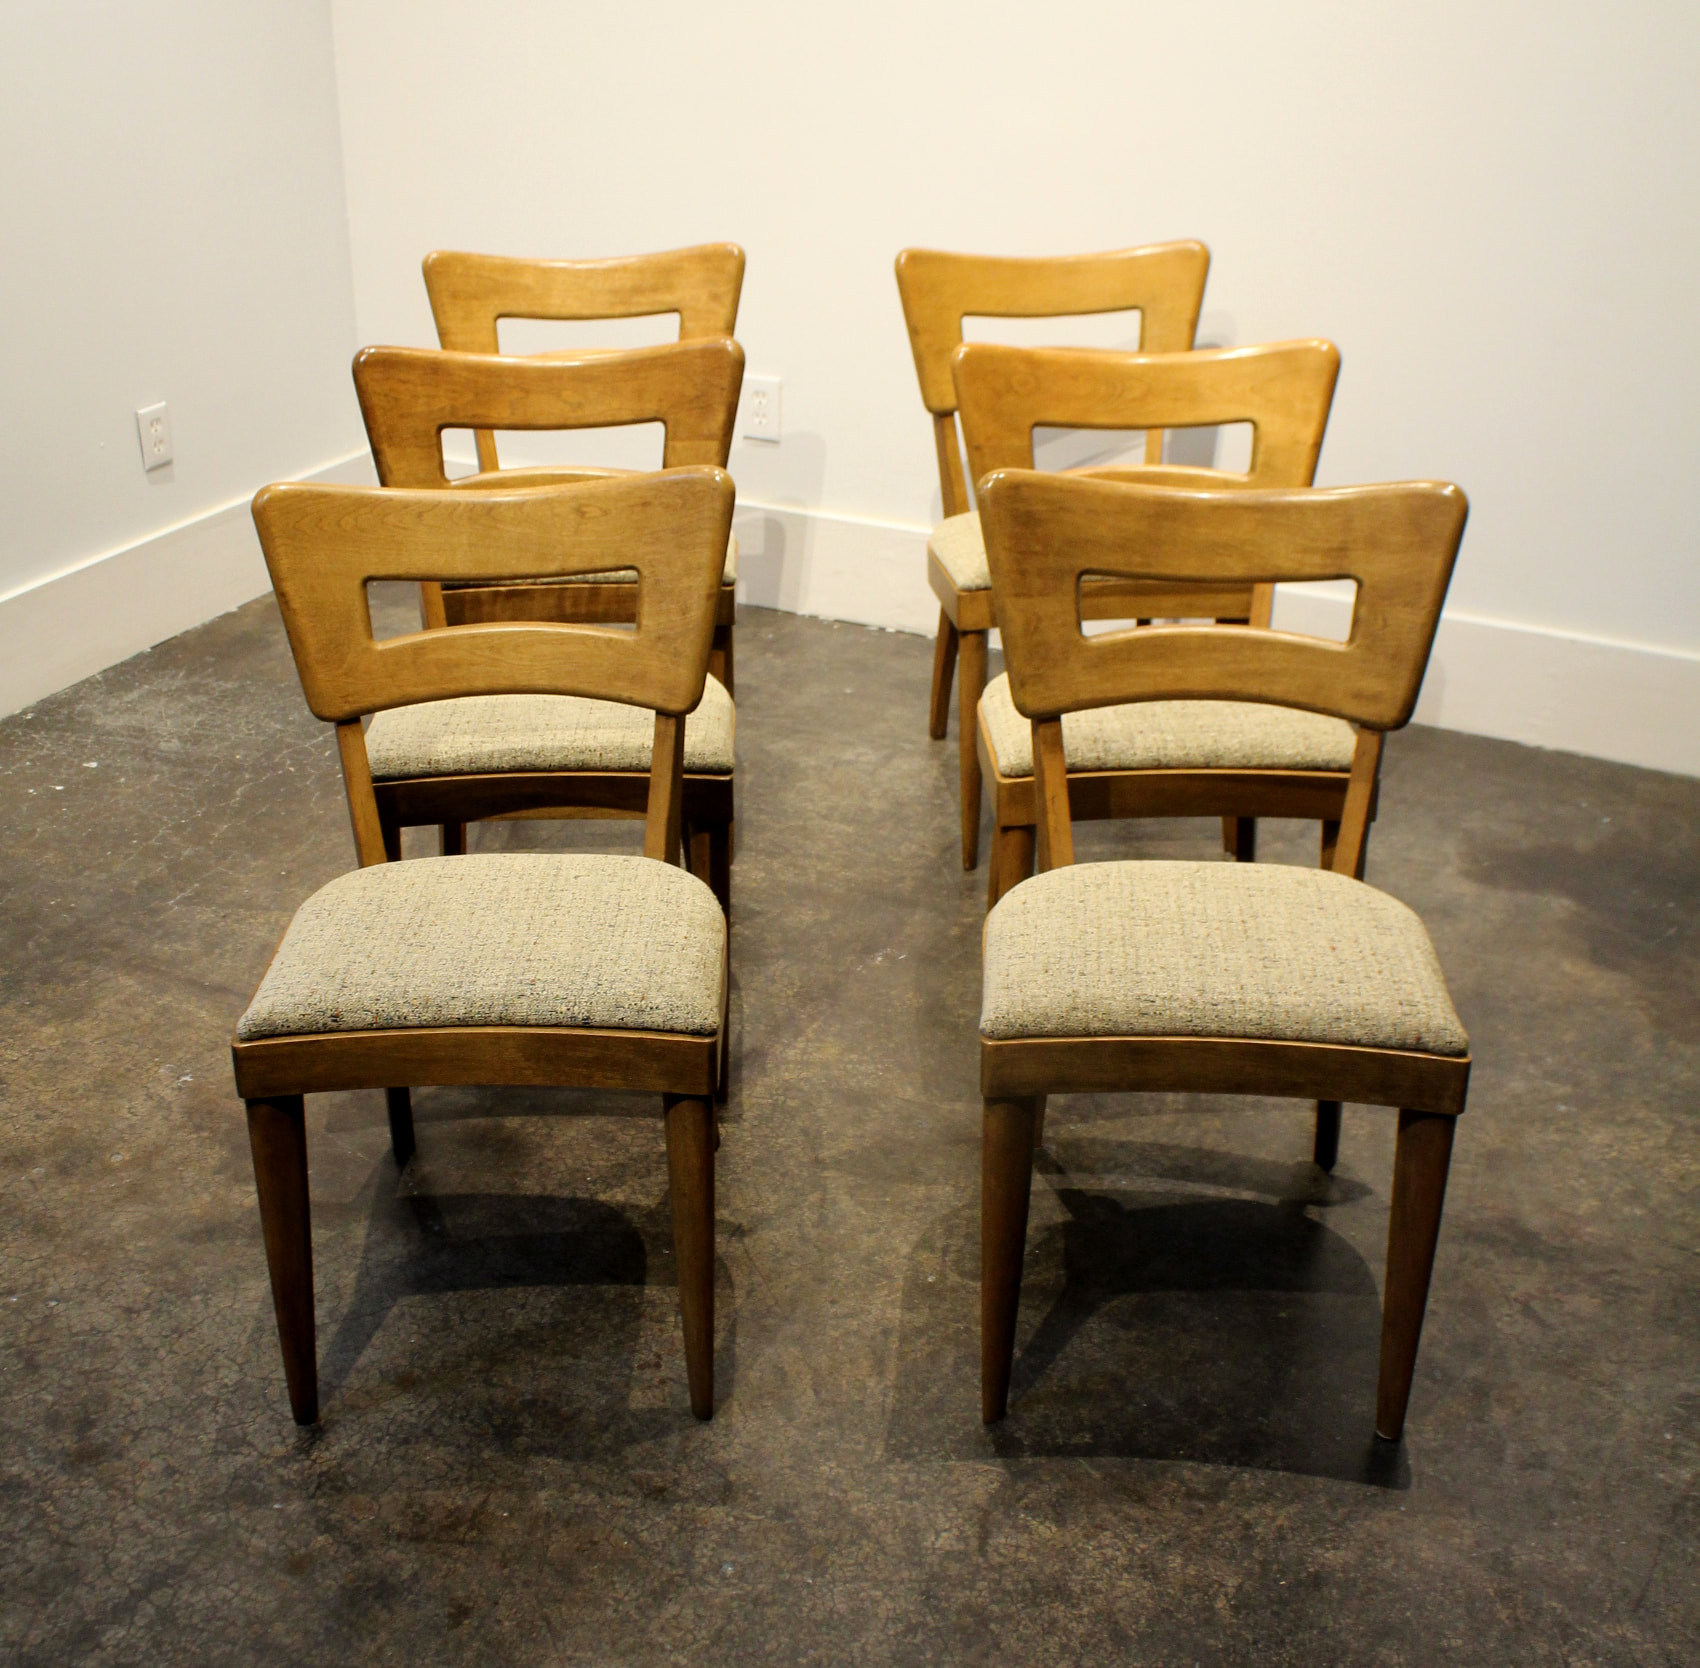 heywood wakefield dogbone chairs s shaped dining set of 6 iconic mid century modern quotdog